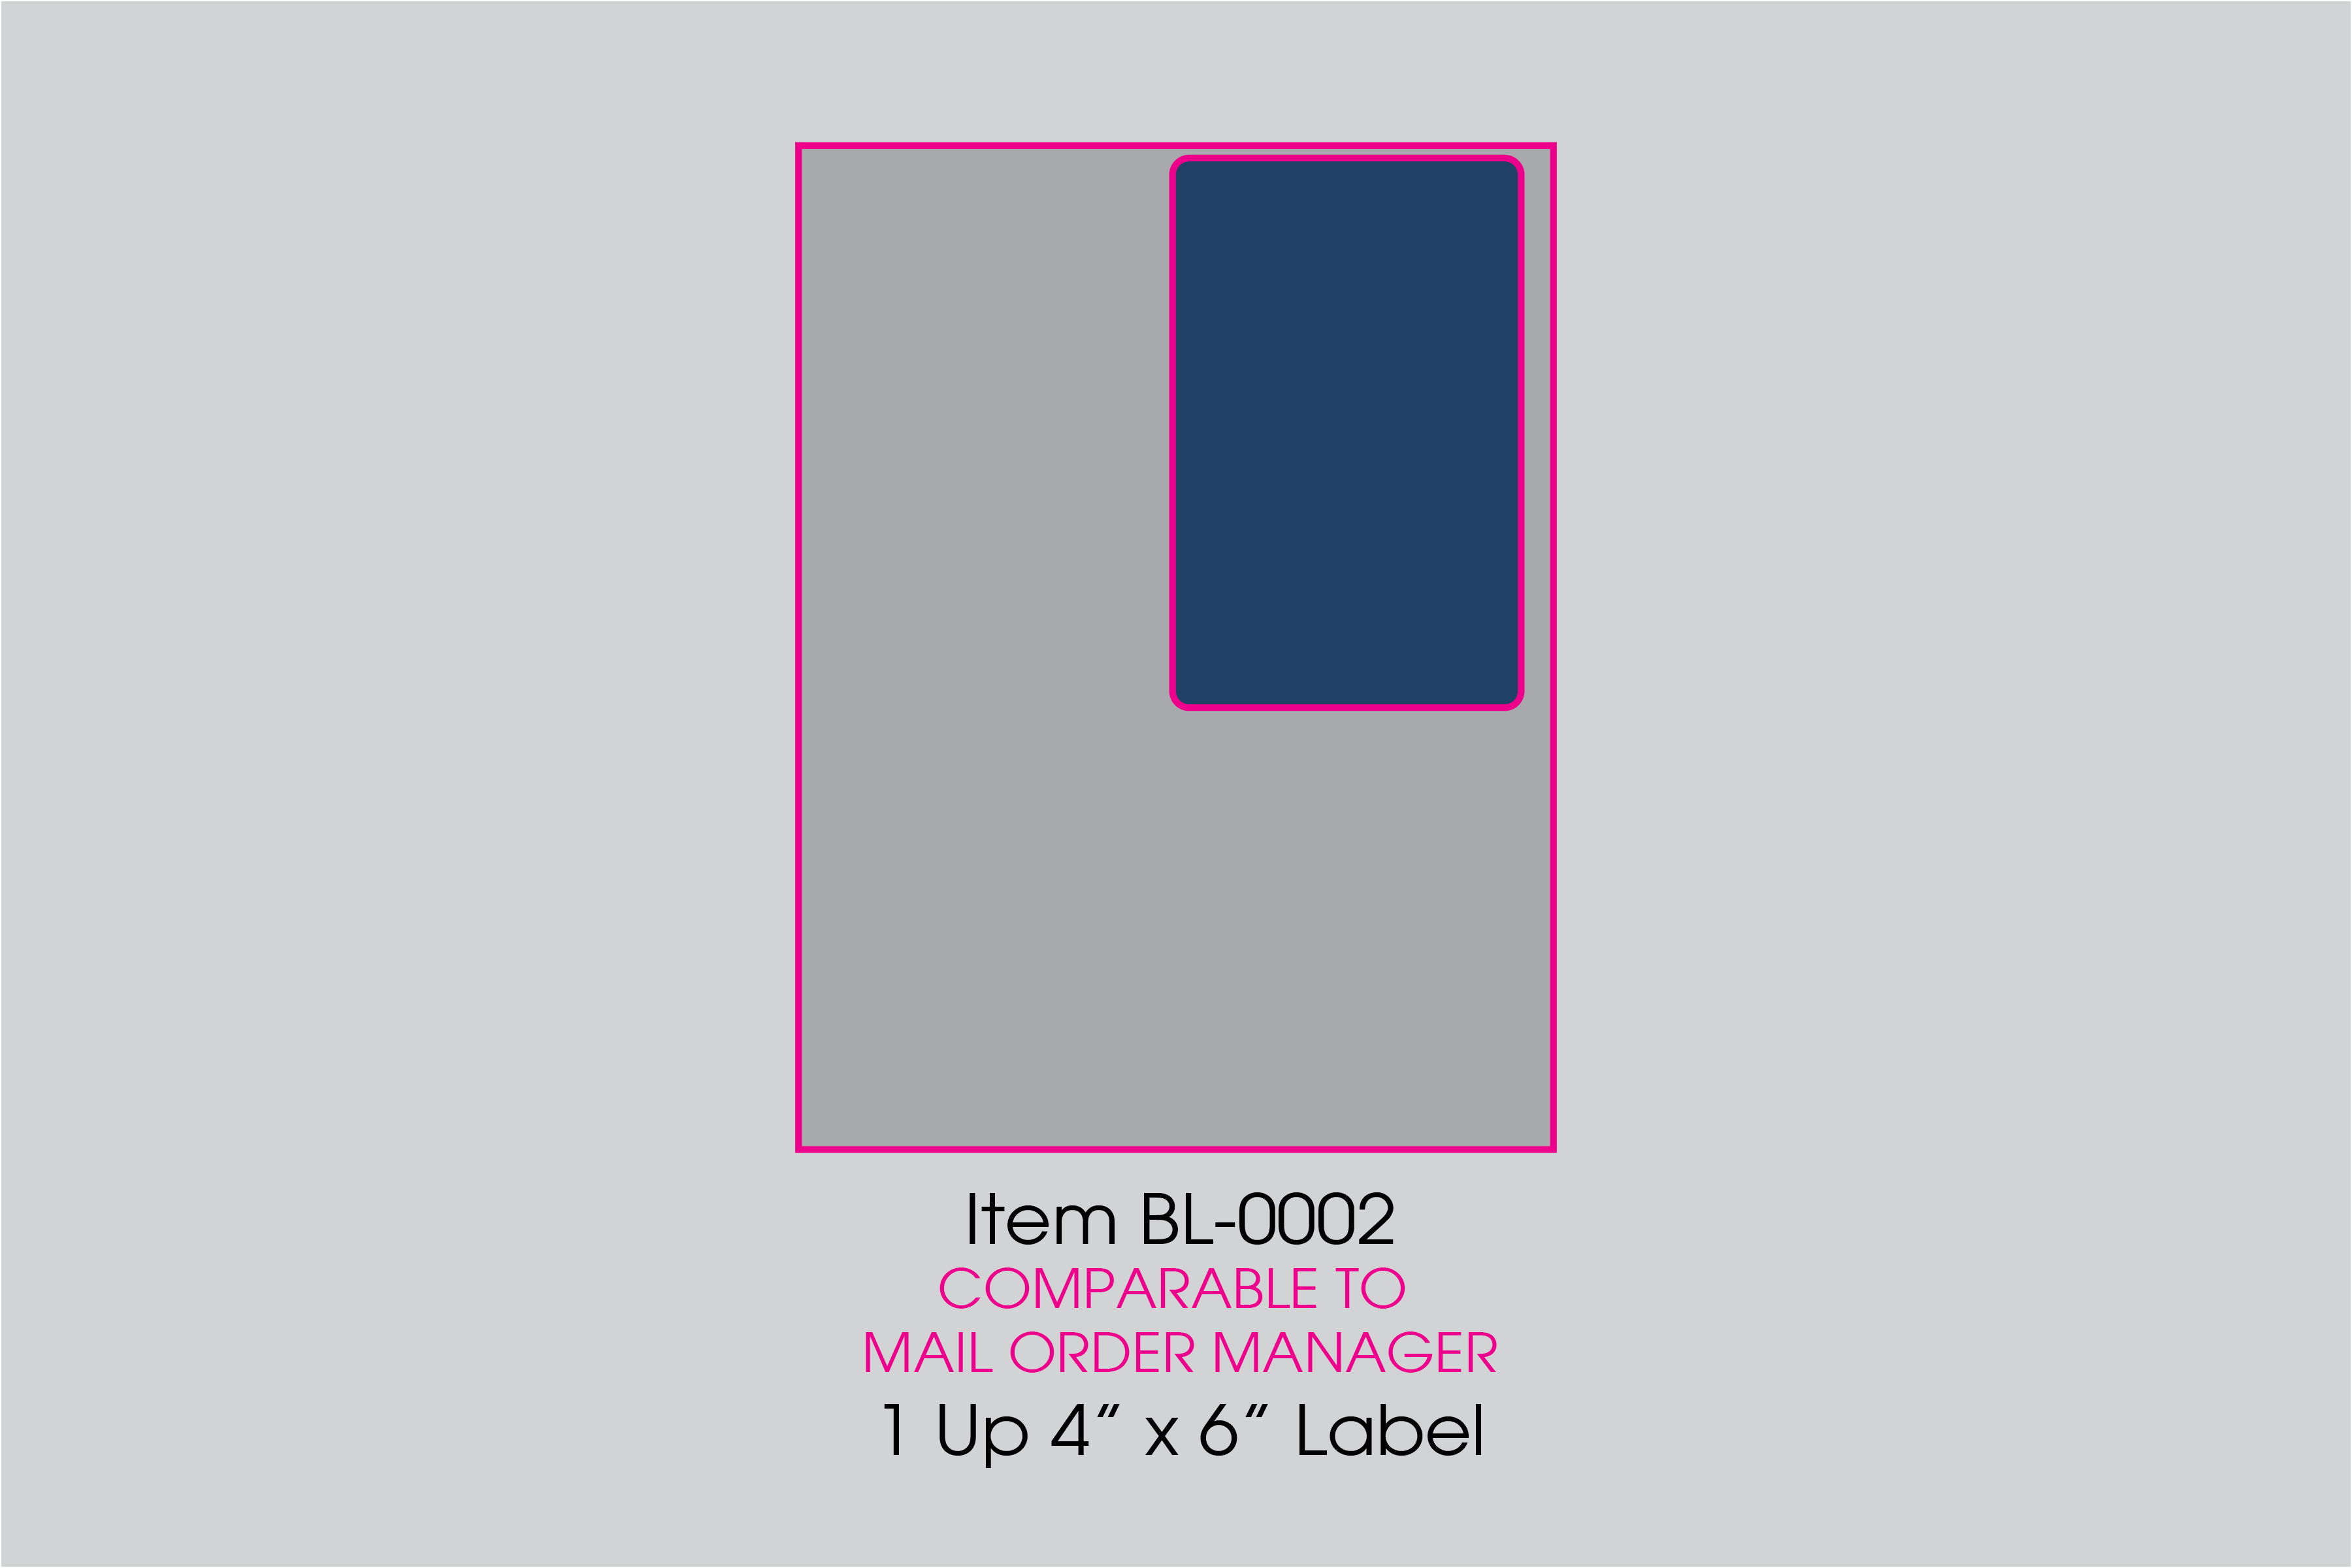 BL-0002